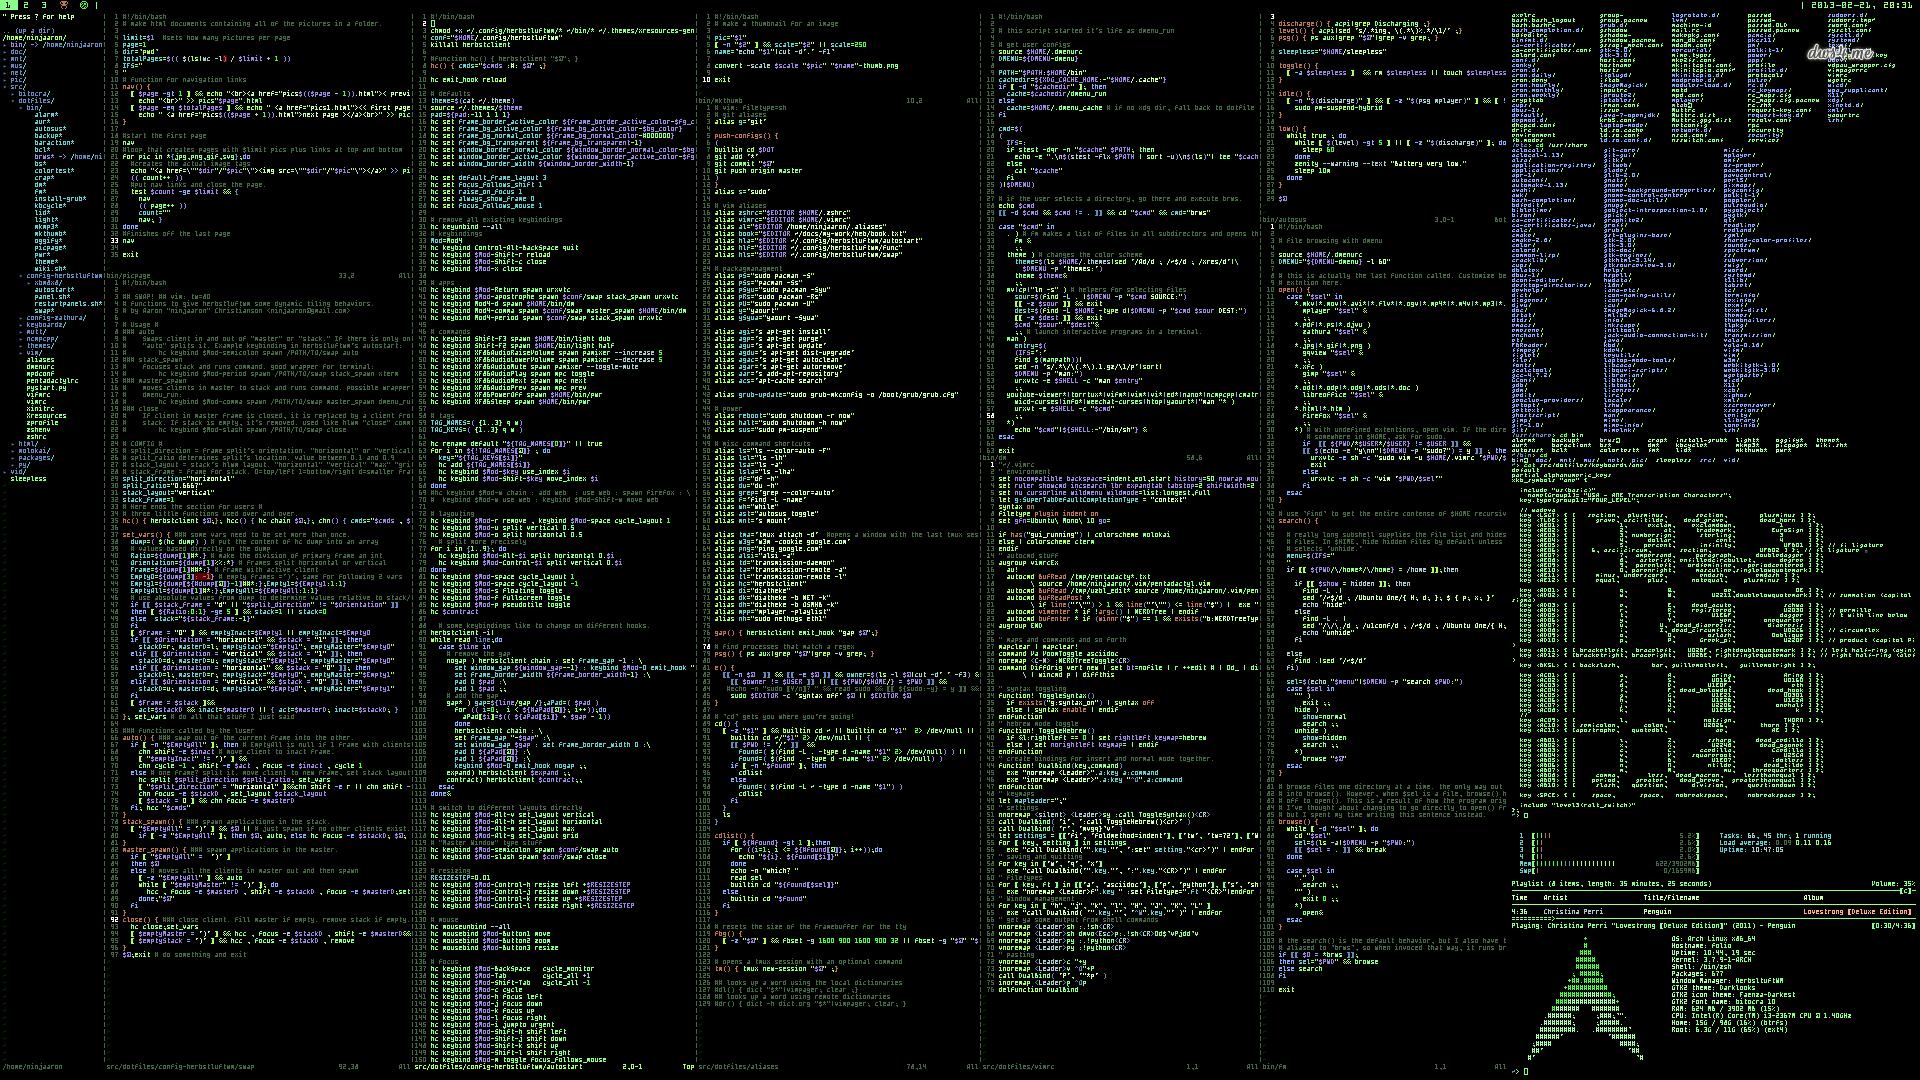 Installation on Linux - Rxtx